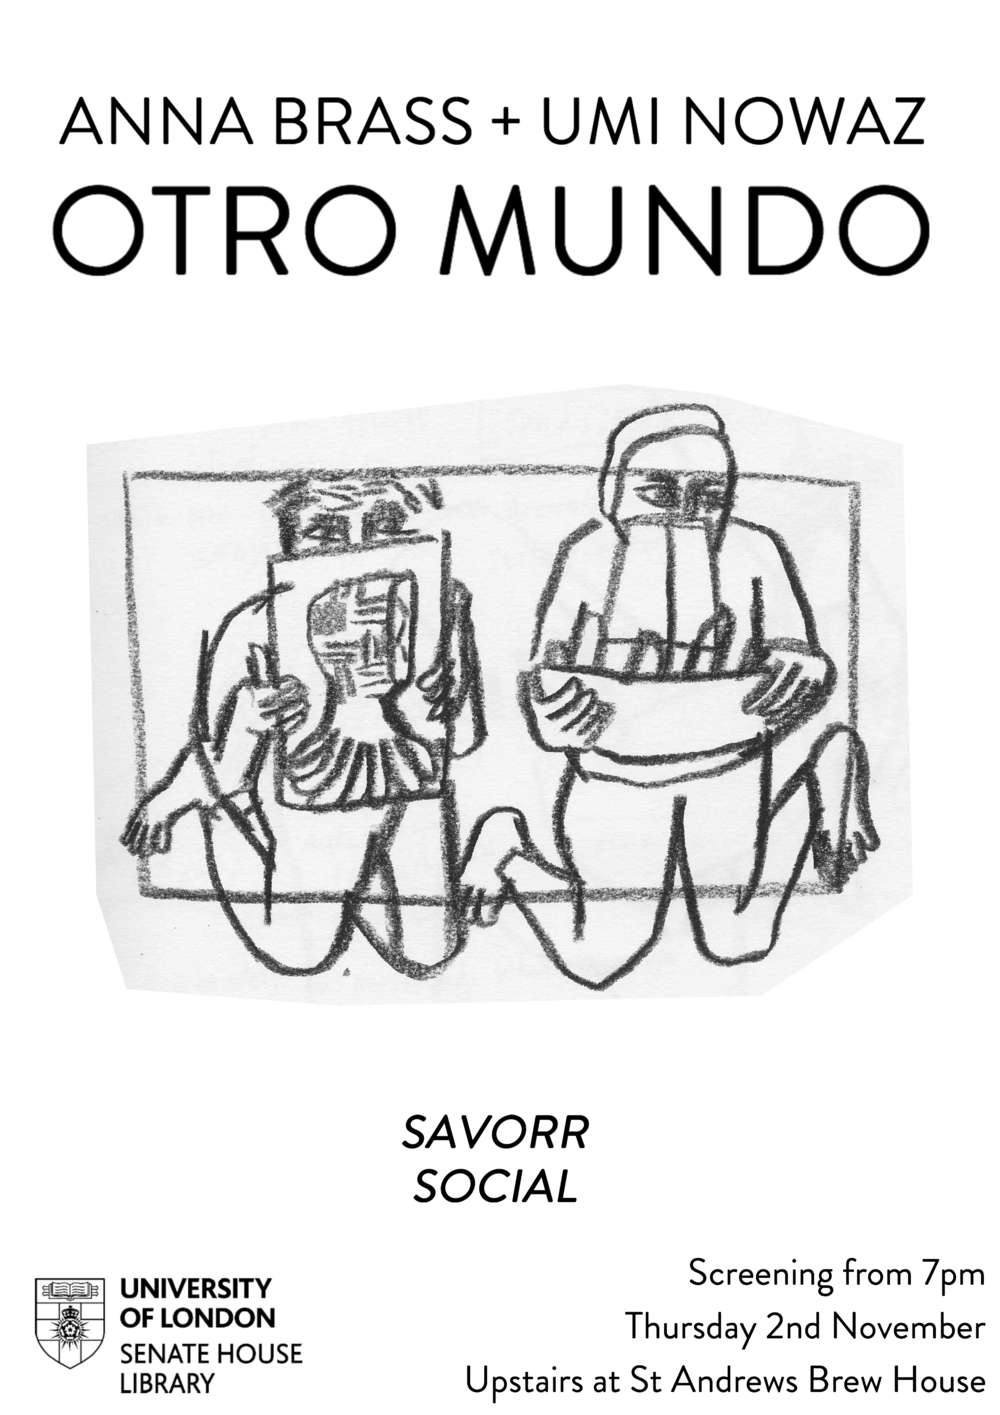 Savorr Social Otro Mundo A4 (1).png